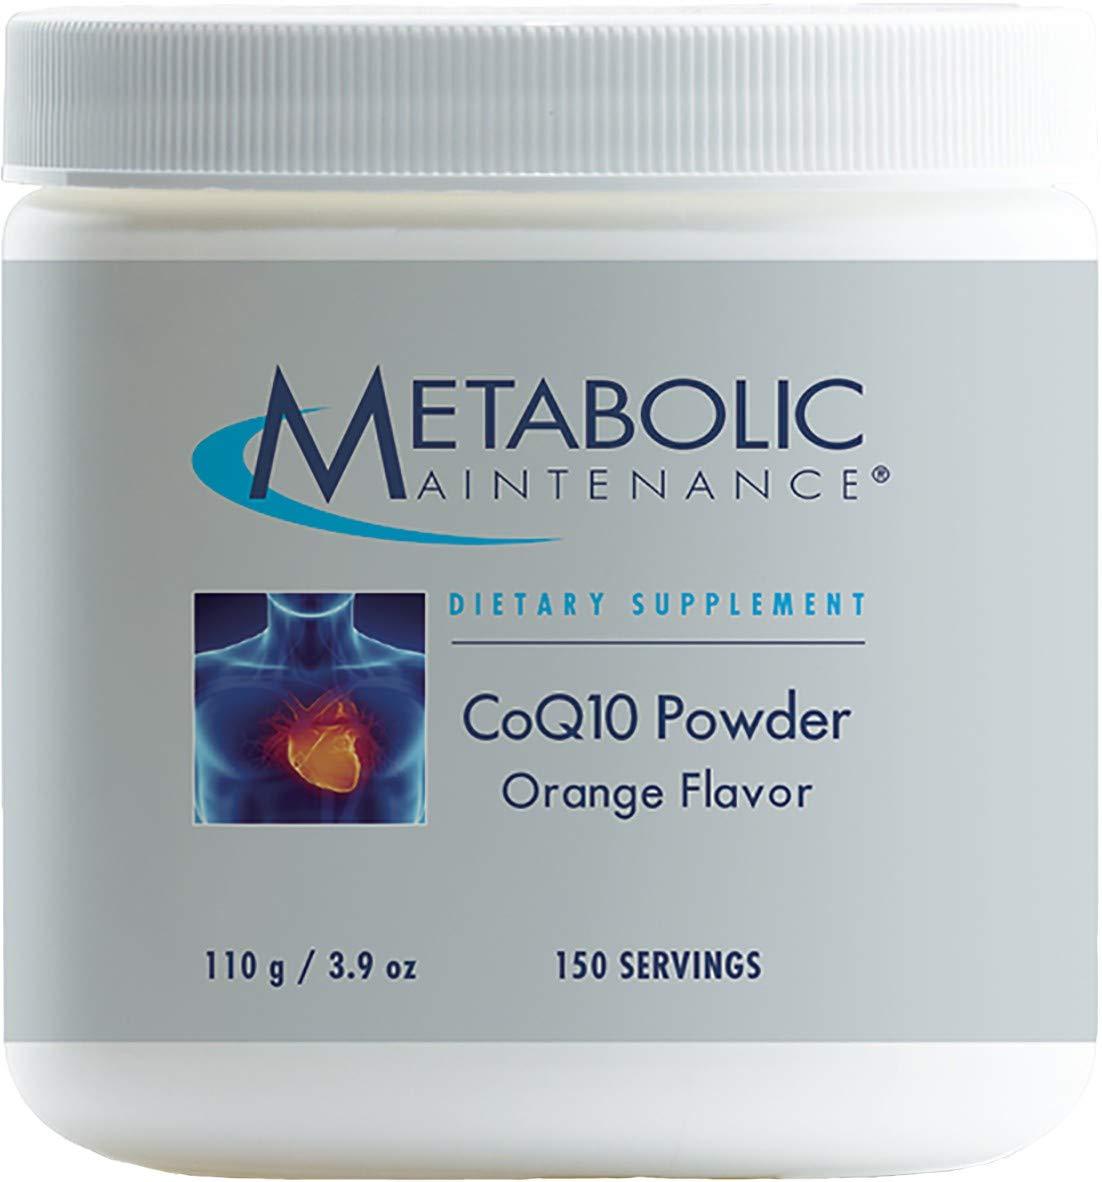 Metabolic Maintenance - CoQ10 Powder - Optimal Absorption + Energy Support, 150 Servings, 100 Grams